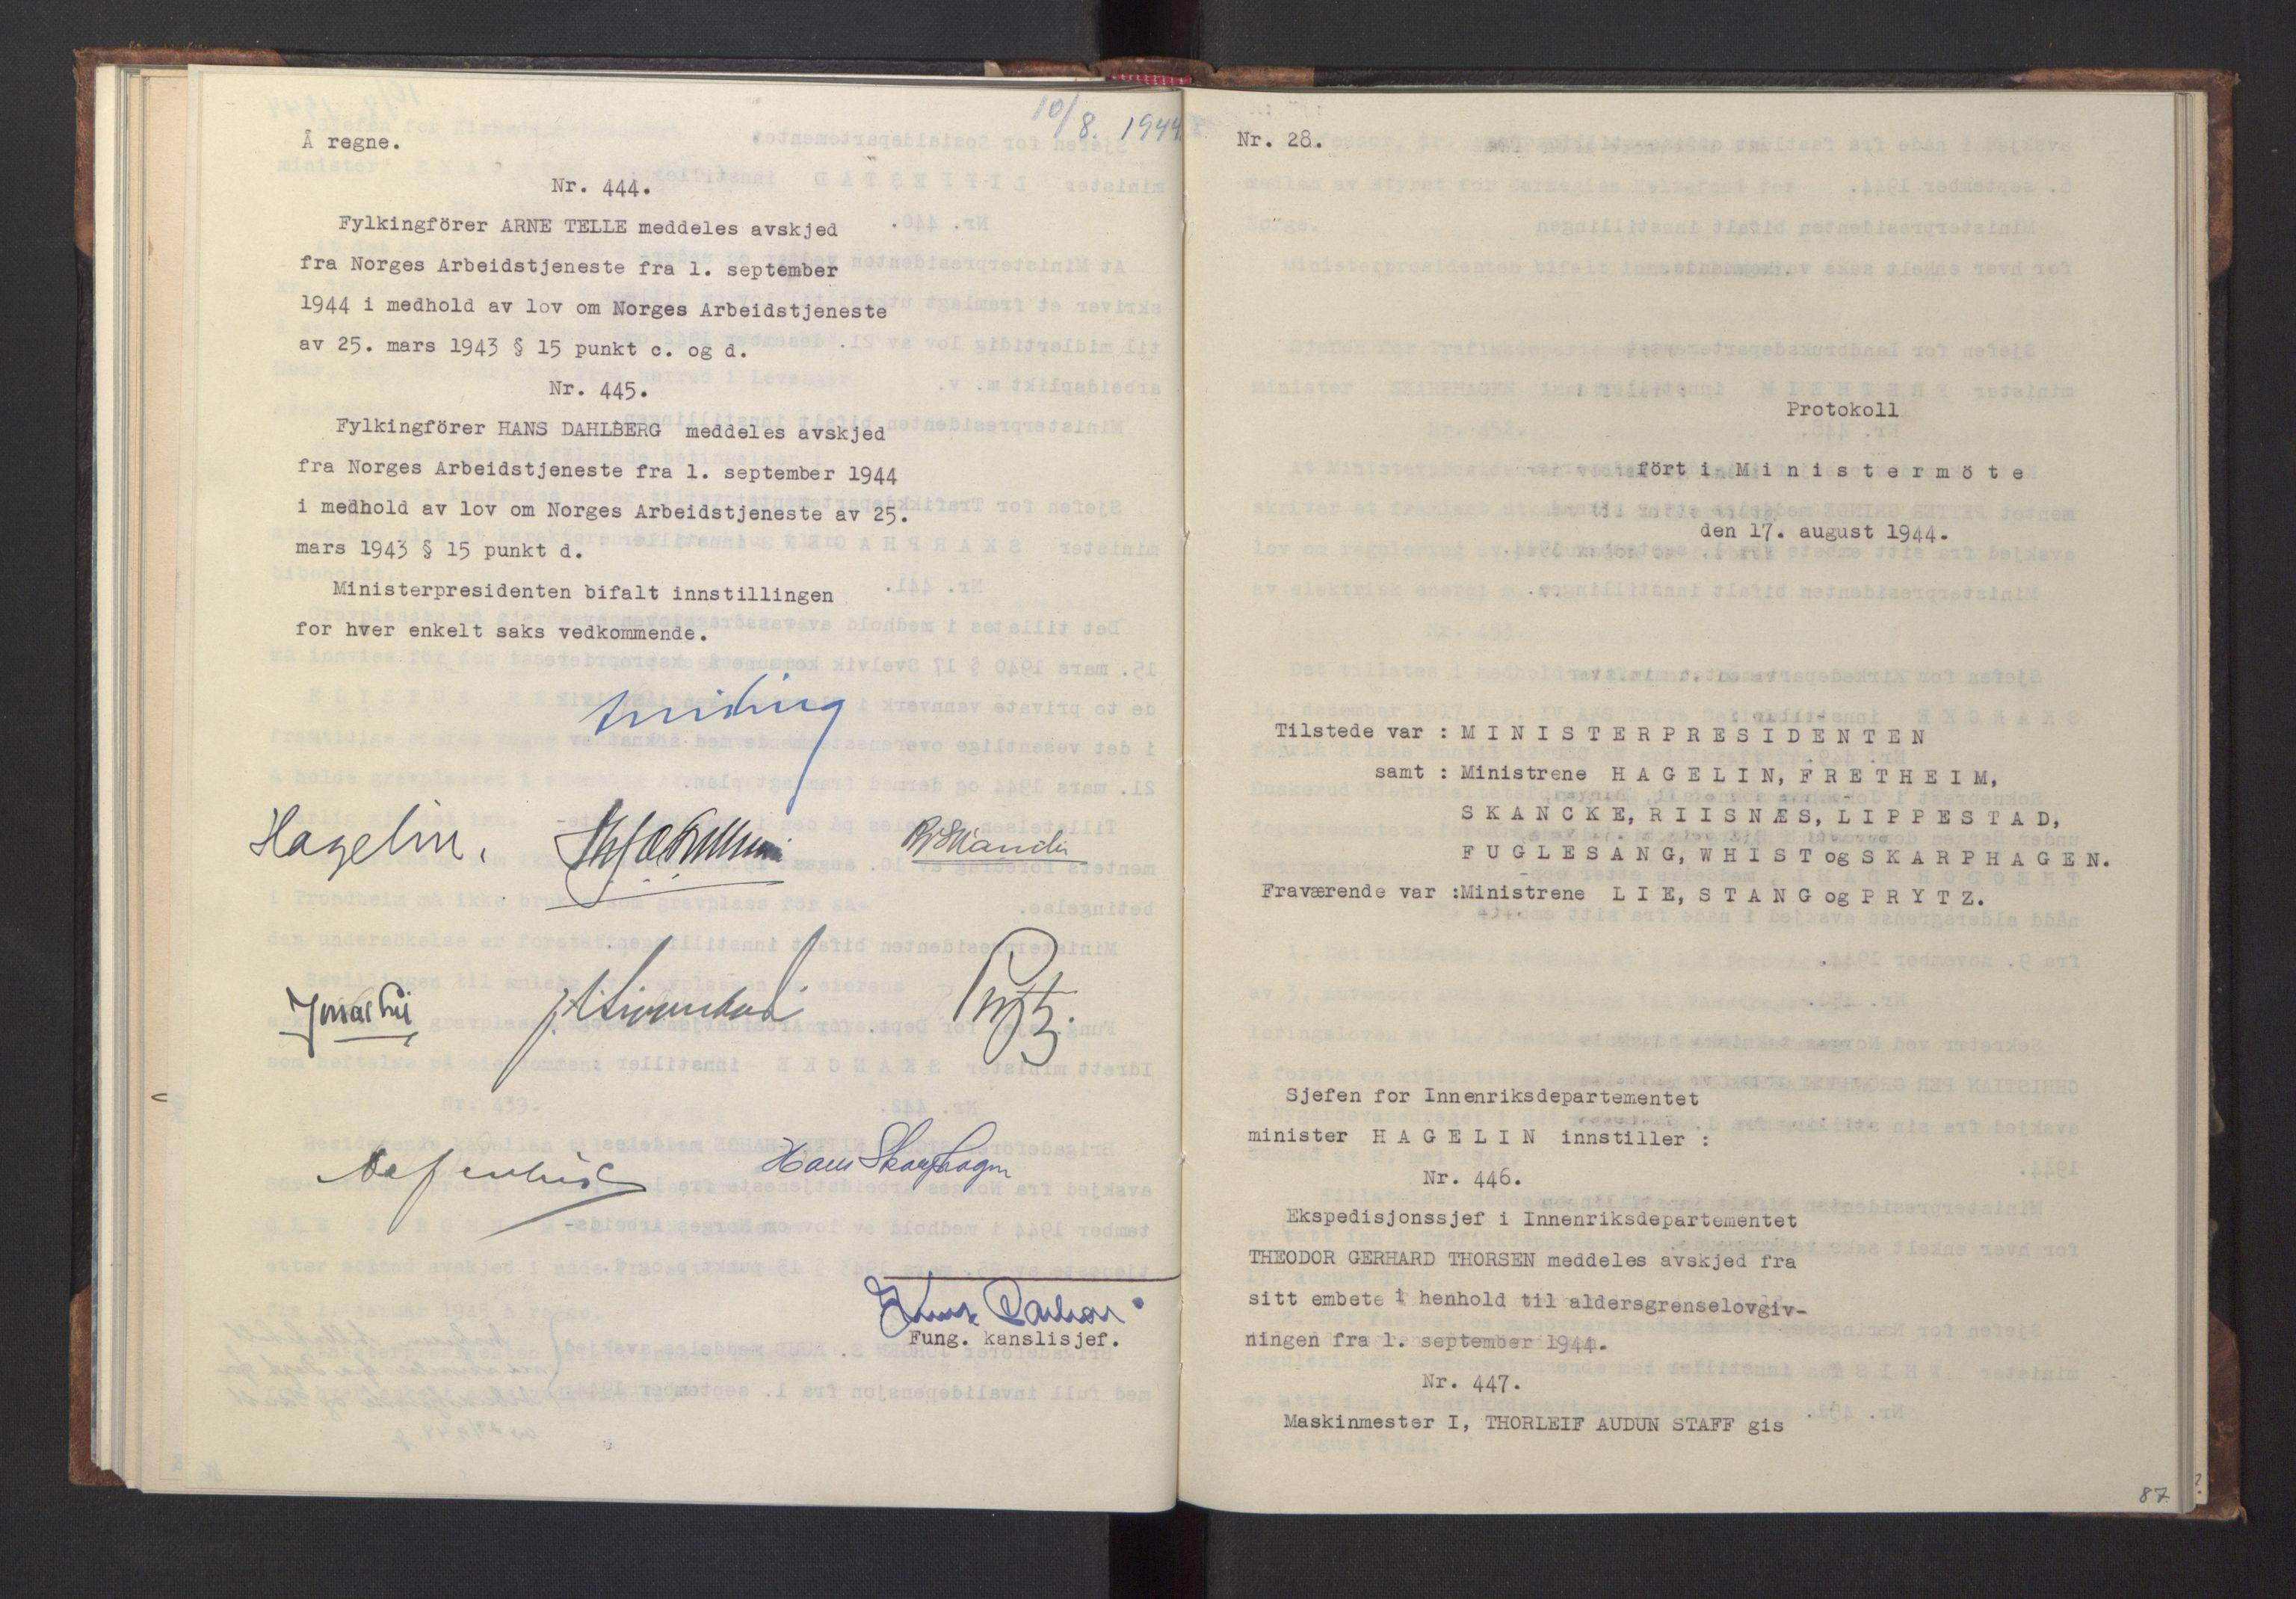 RA, NS-administrasjonen 1940-1945 (Statsrådsekretariatet, de kommisariske statsråder mm), D/Da/L0005: Protokoll fra ministermøter, 1944, s. 86b-87a